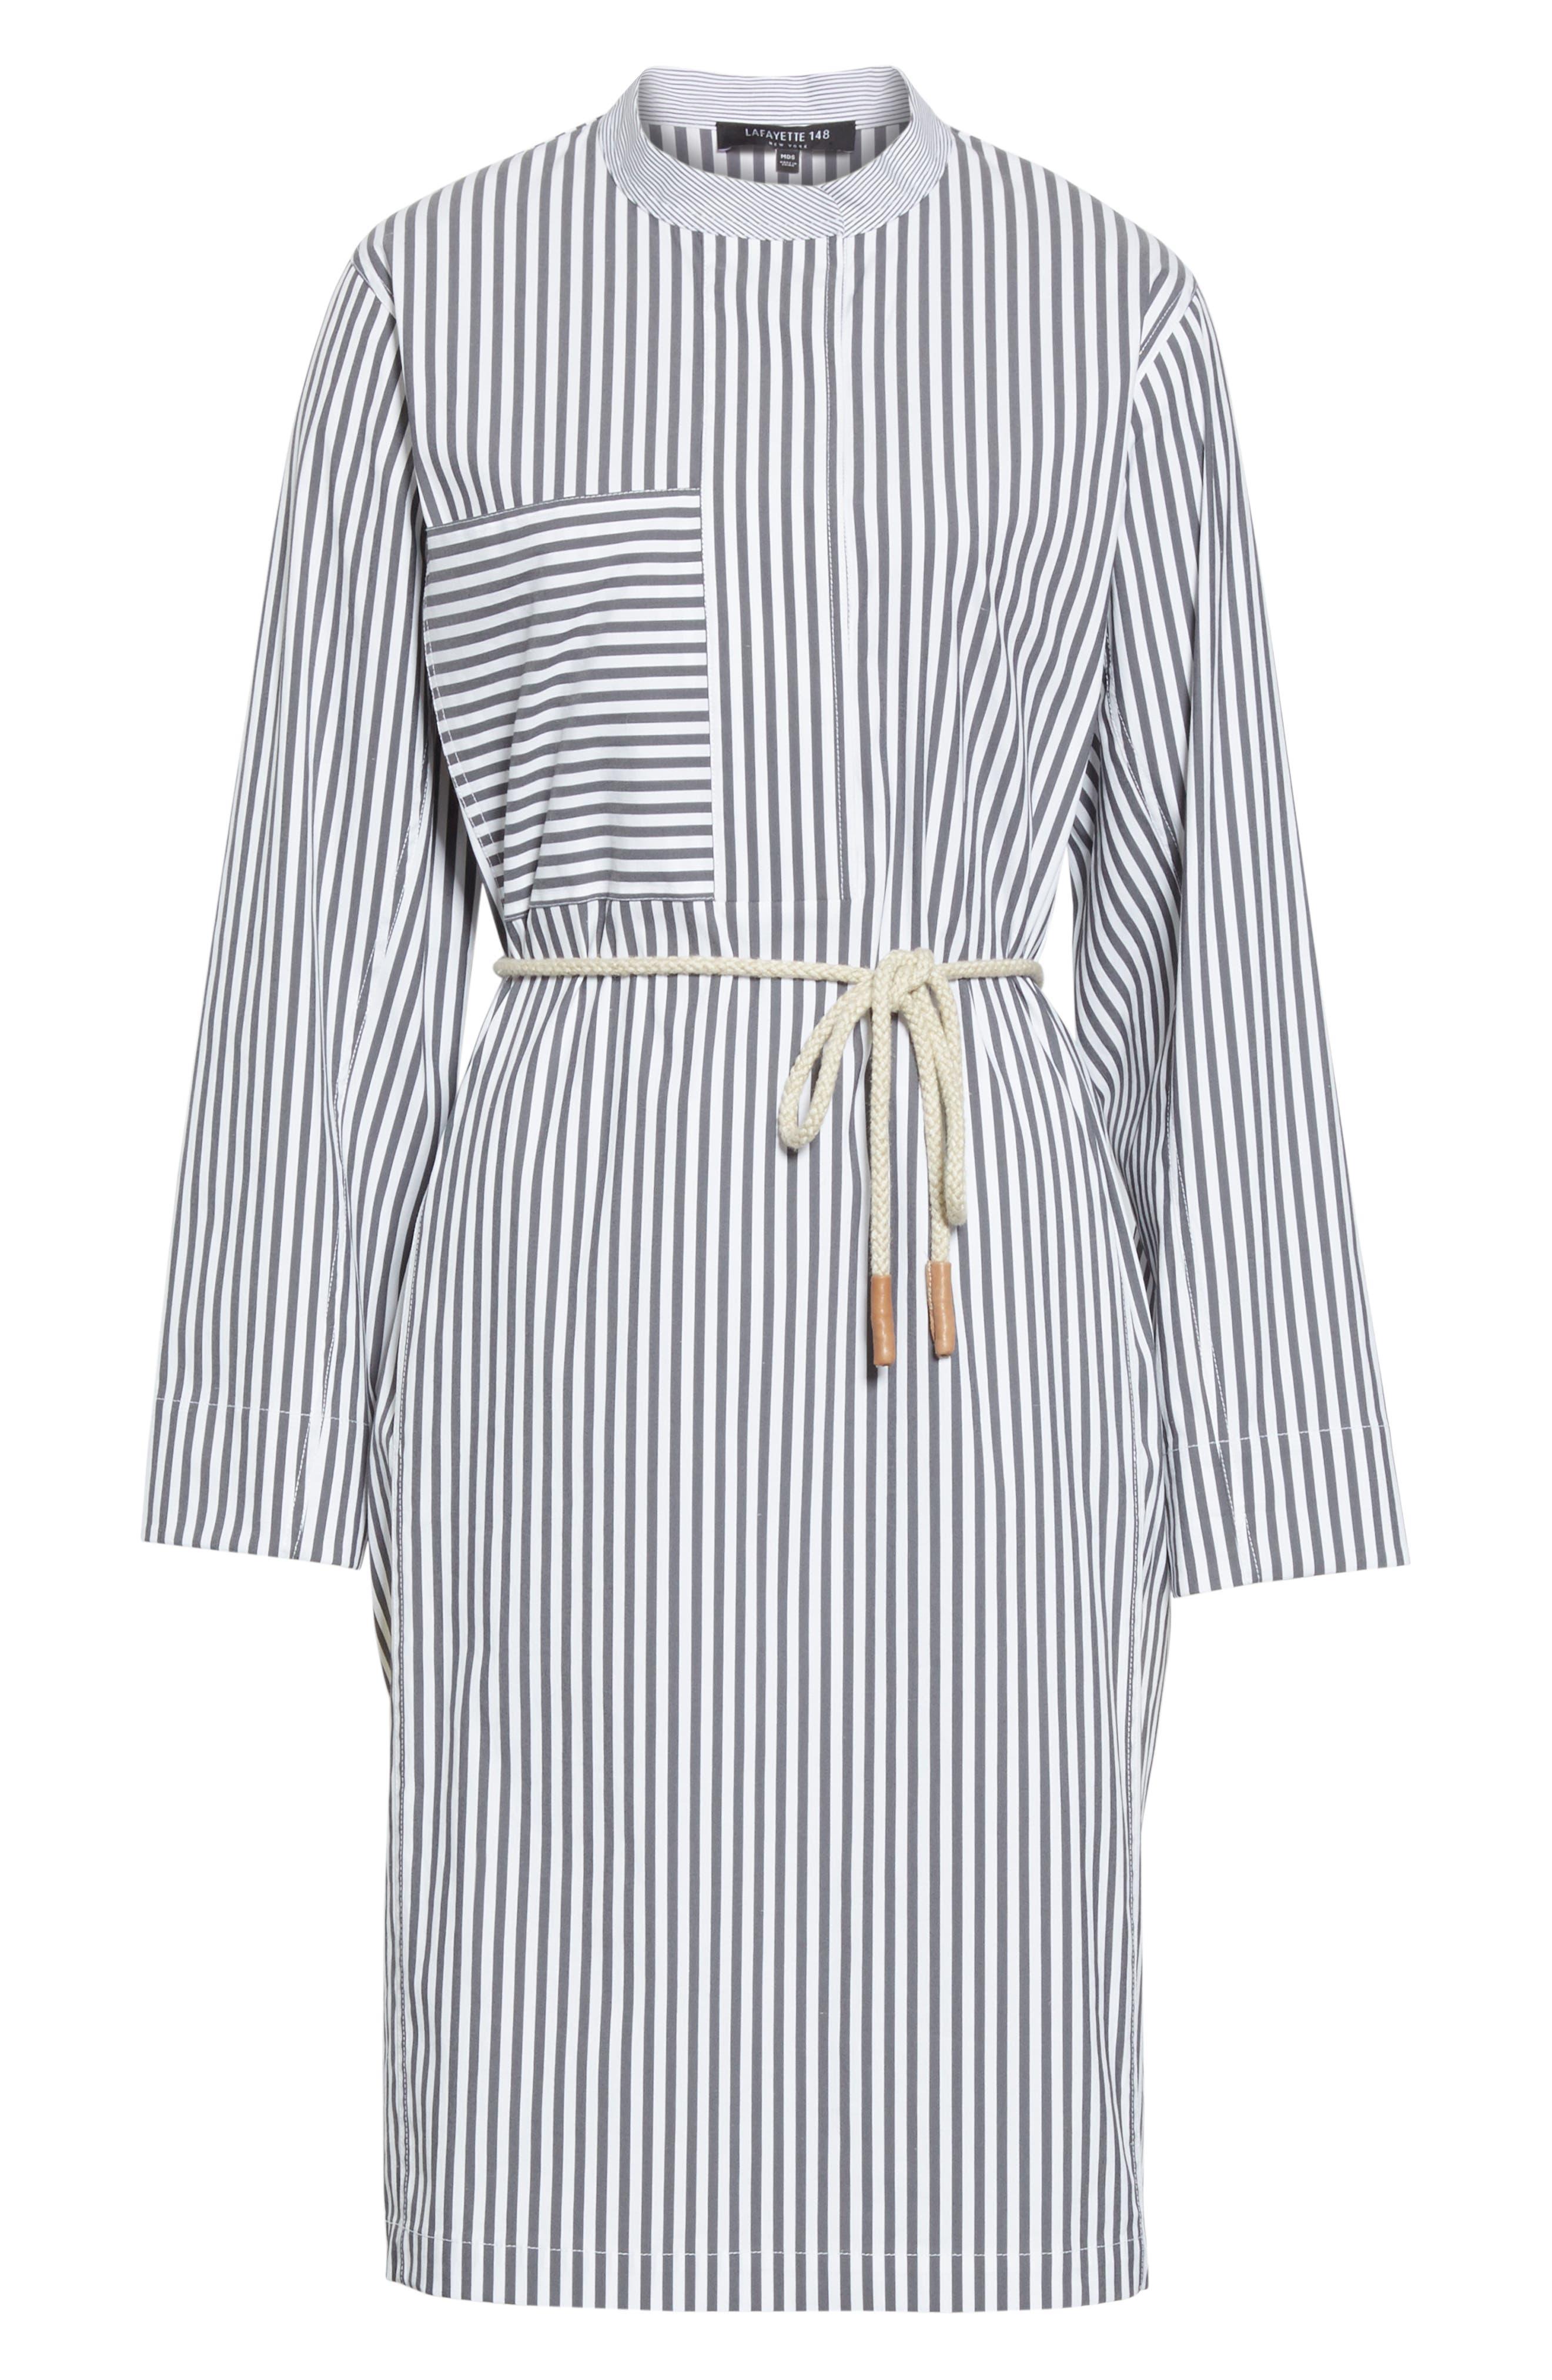 LAFAYETTE 148 NEW YORK, Rexana Stripe Long Sleeve Belted Shirtdress, Alternate thumbnail 7, color, ASH MULTI